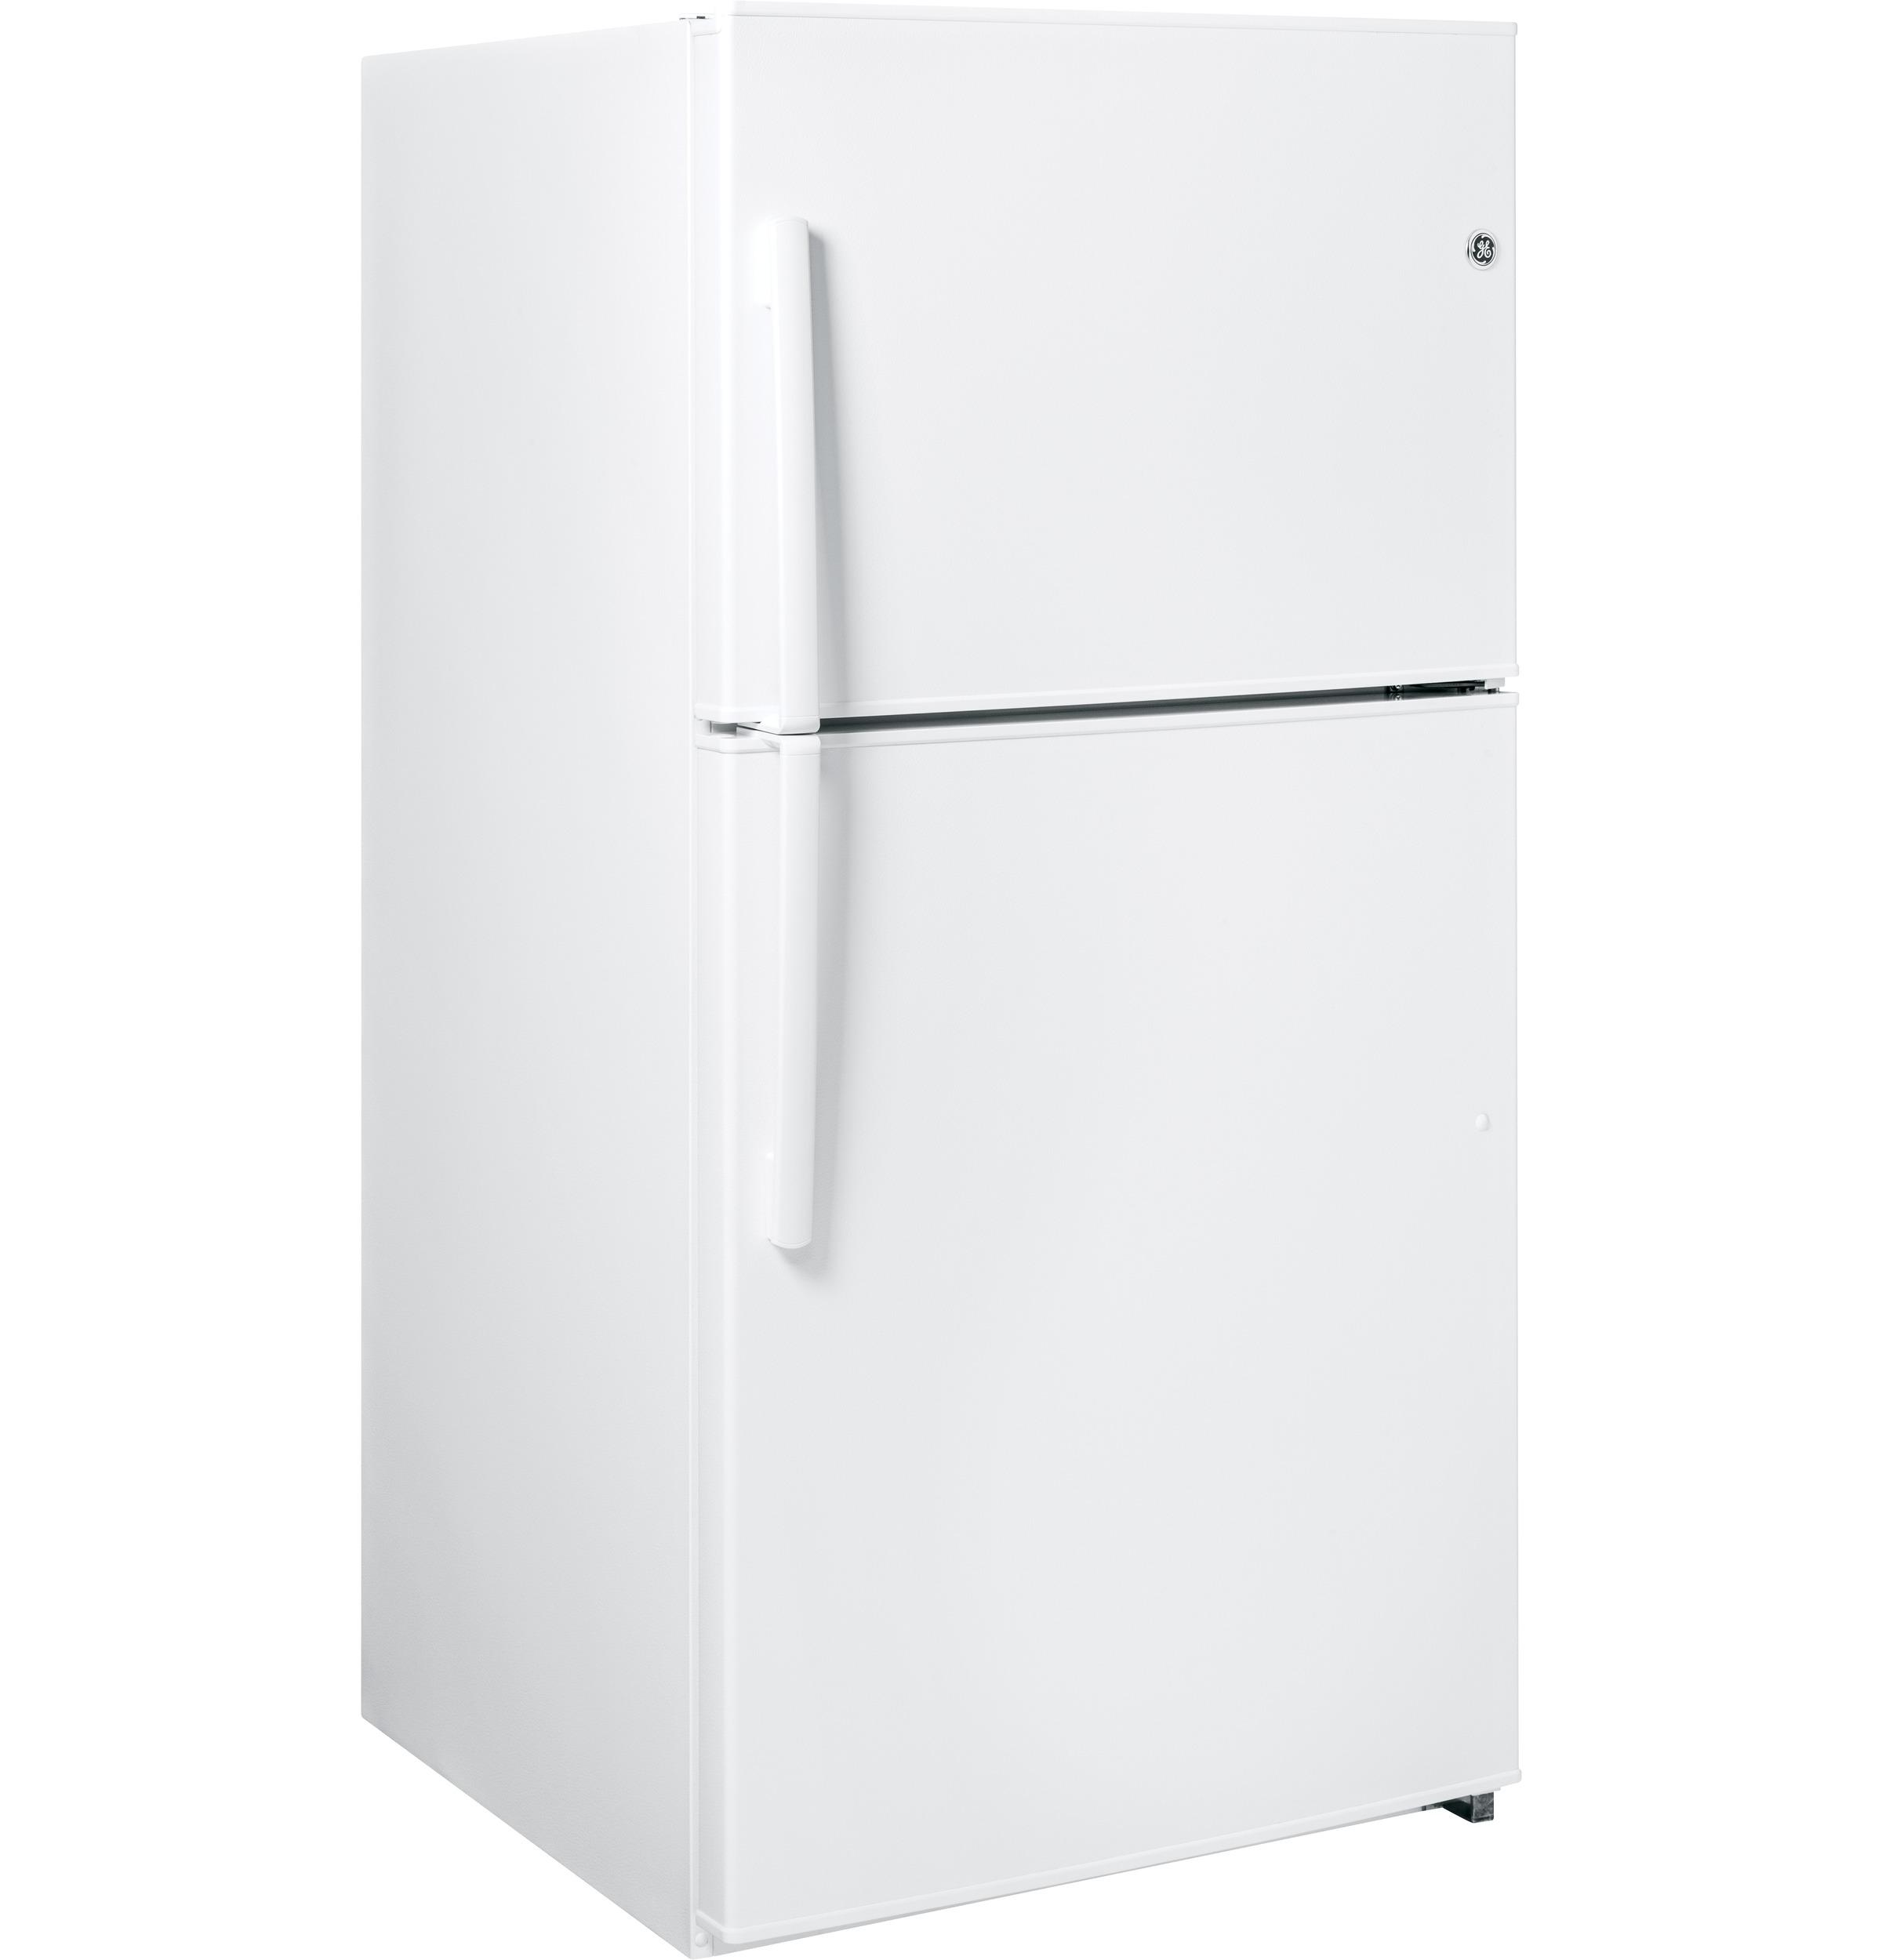 GE Appliances 21.2 cu. ft. Top-Freezer Refrigerator - White